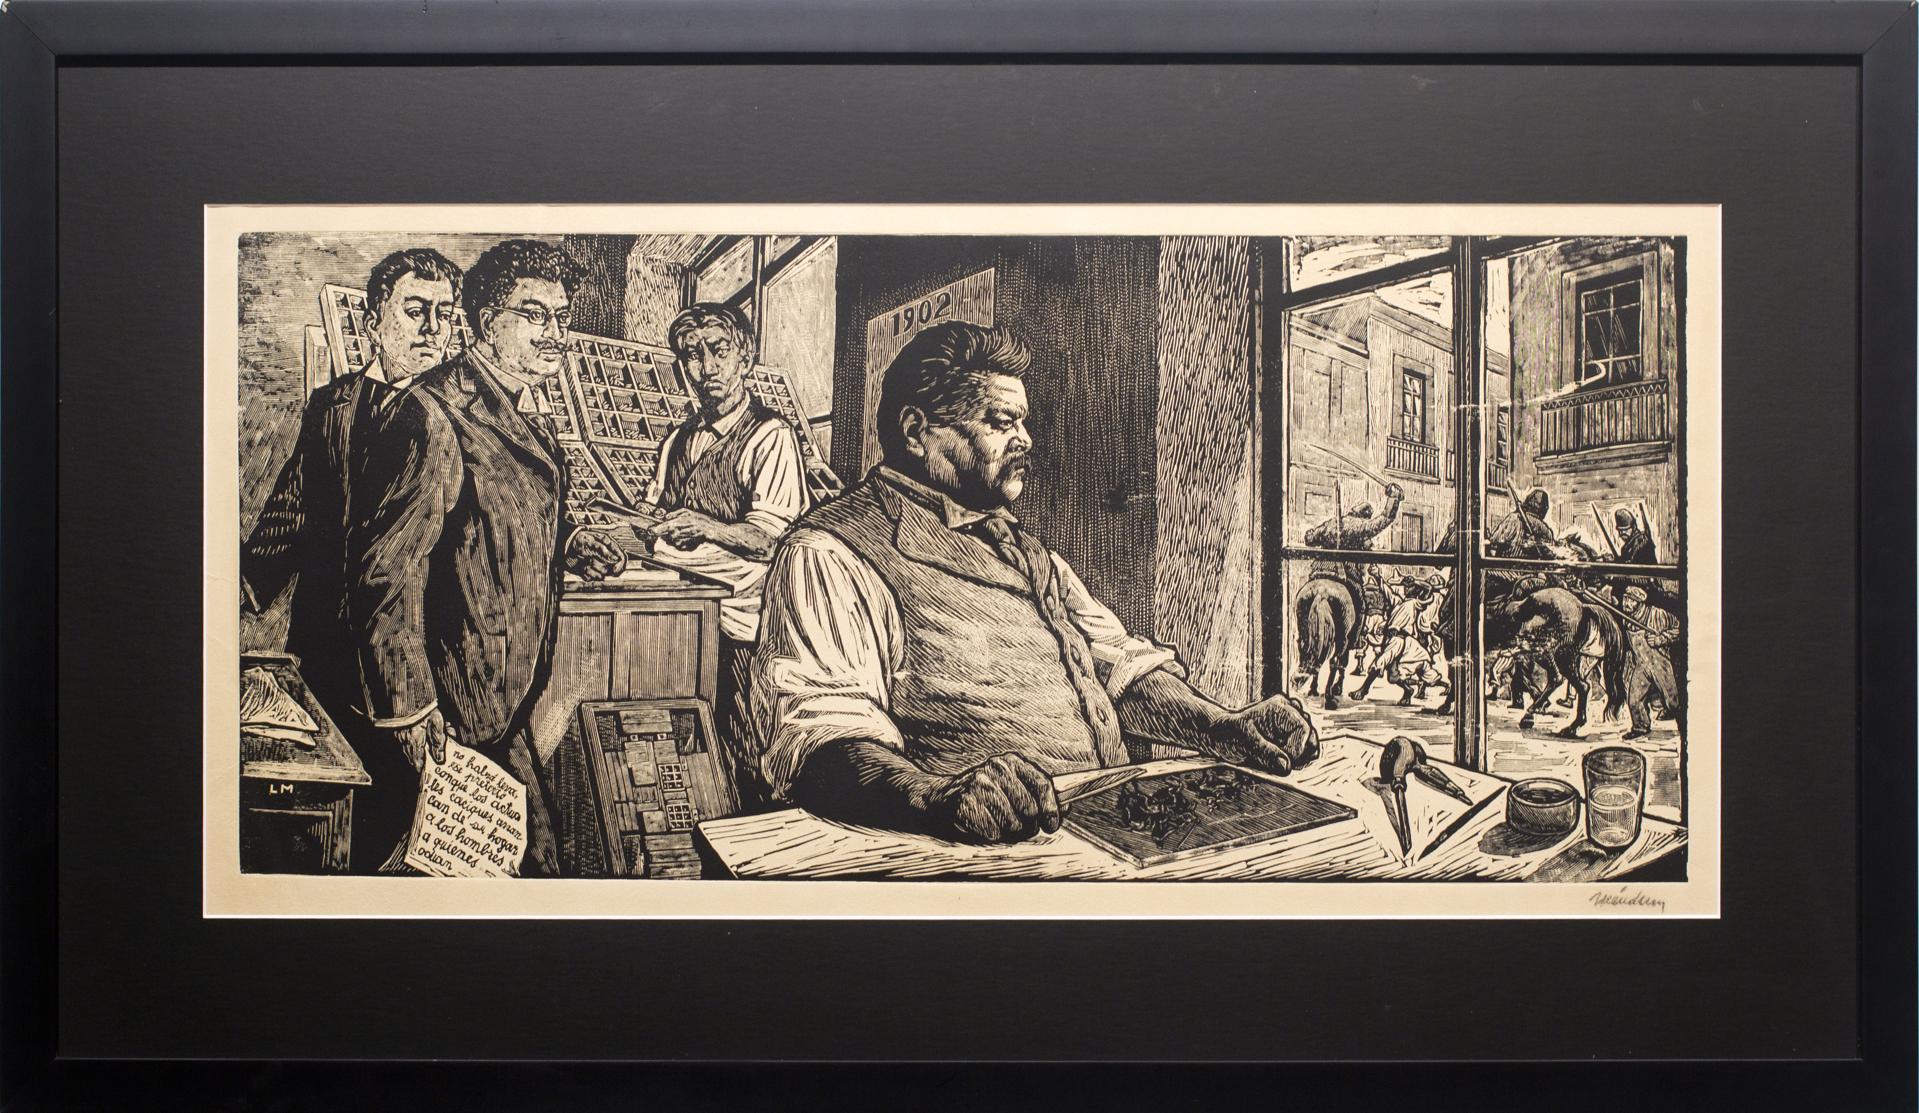 Posada in His Workshop (Homage to Posada) by Leopoldo Méndez (1902 - 1969)